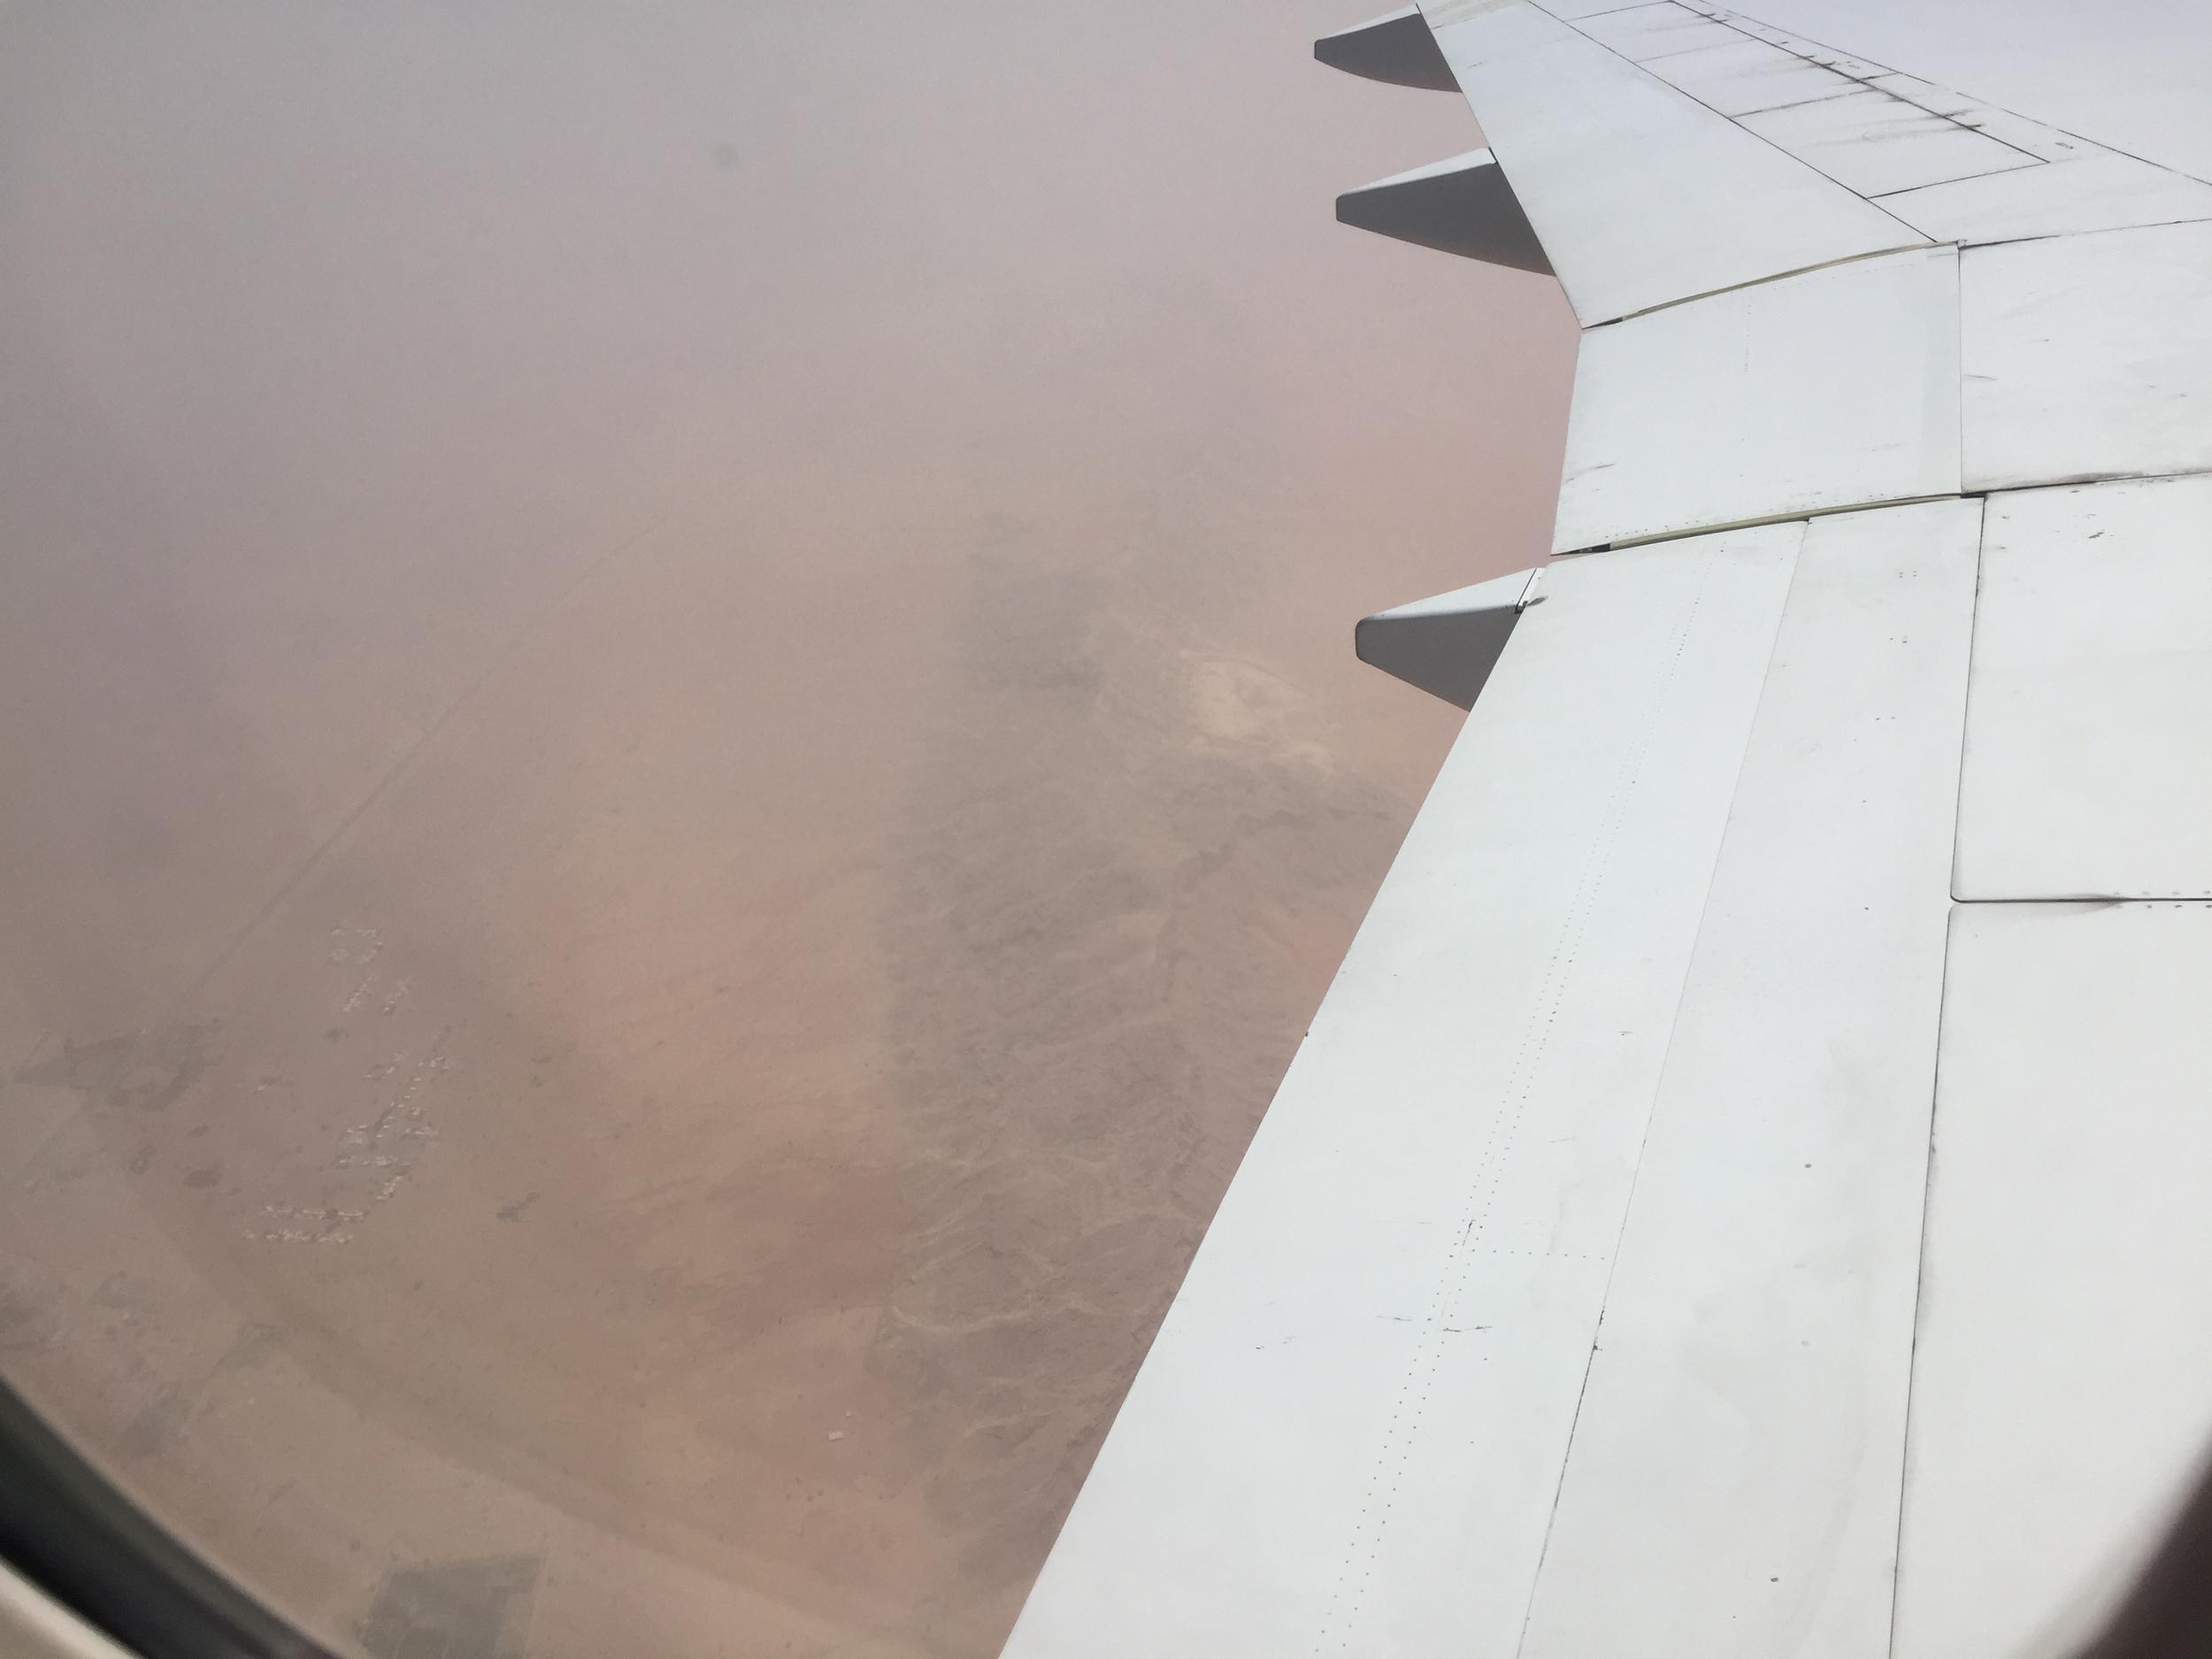 The mountains and dunes around Dubai.